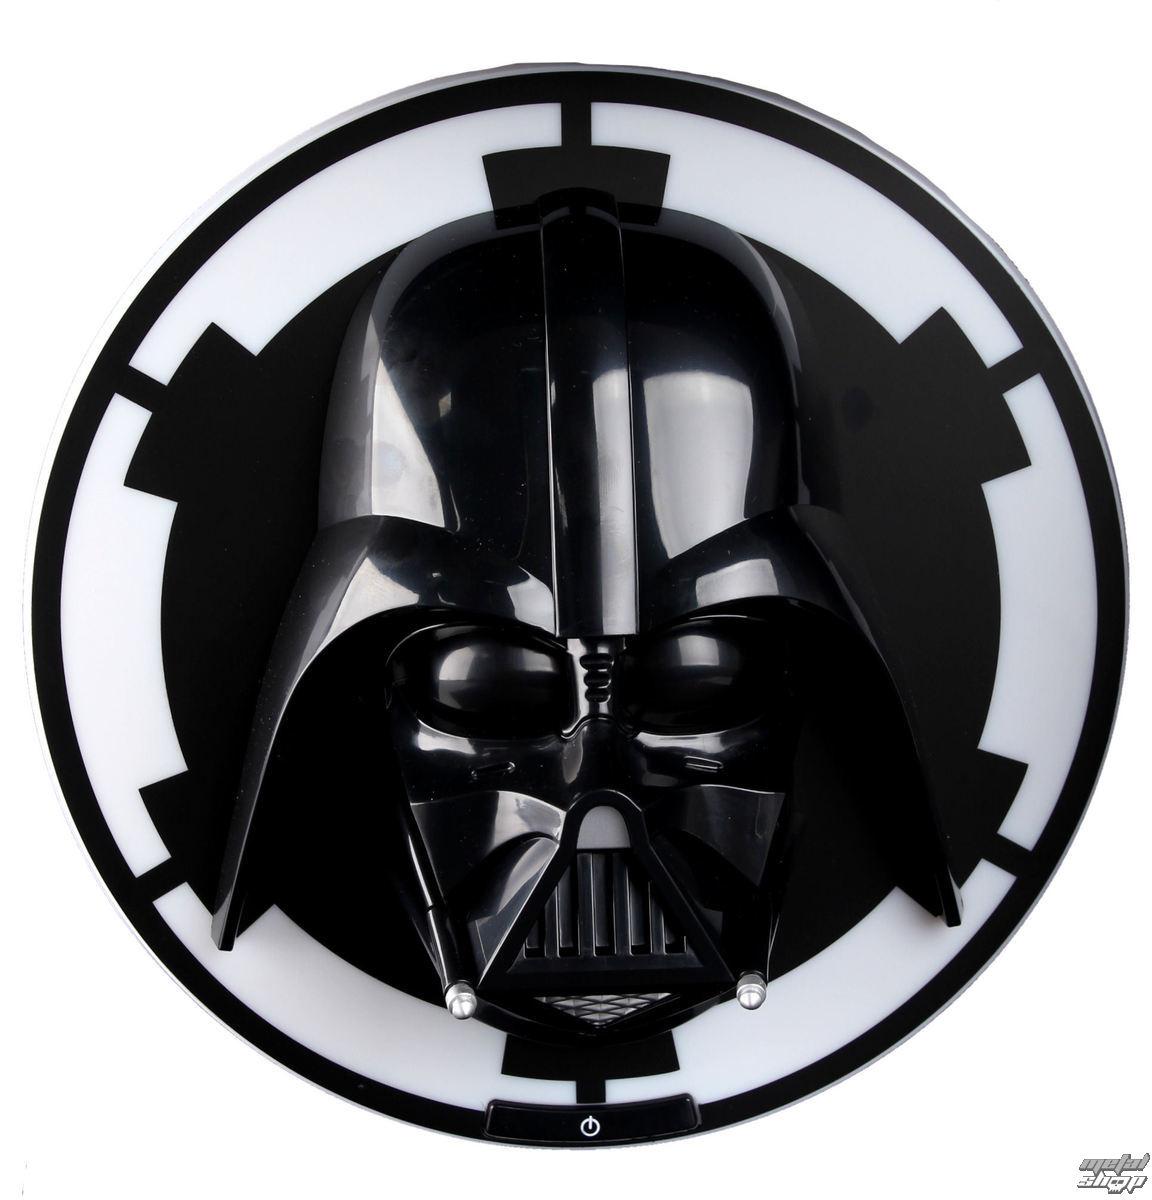 nástenná lampa Star Wars - Darth Vader - BLK - 3DLP16003GI